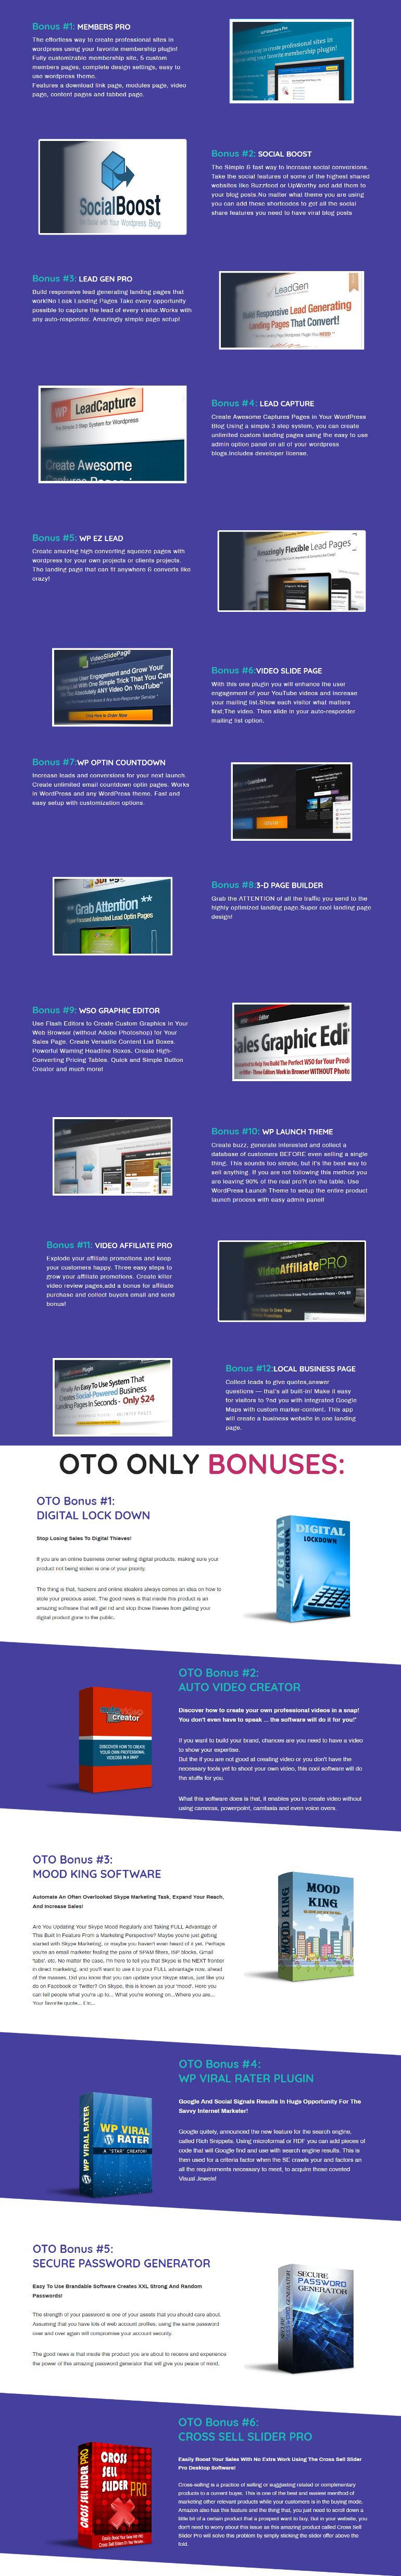 StoryReel Bonuses